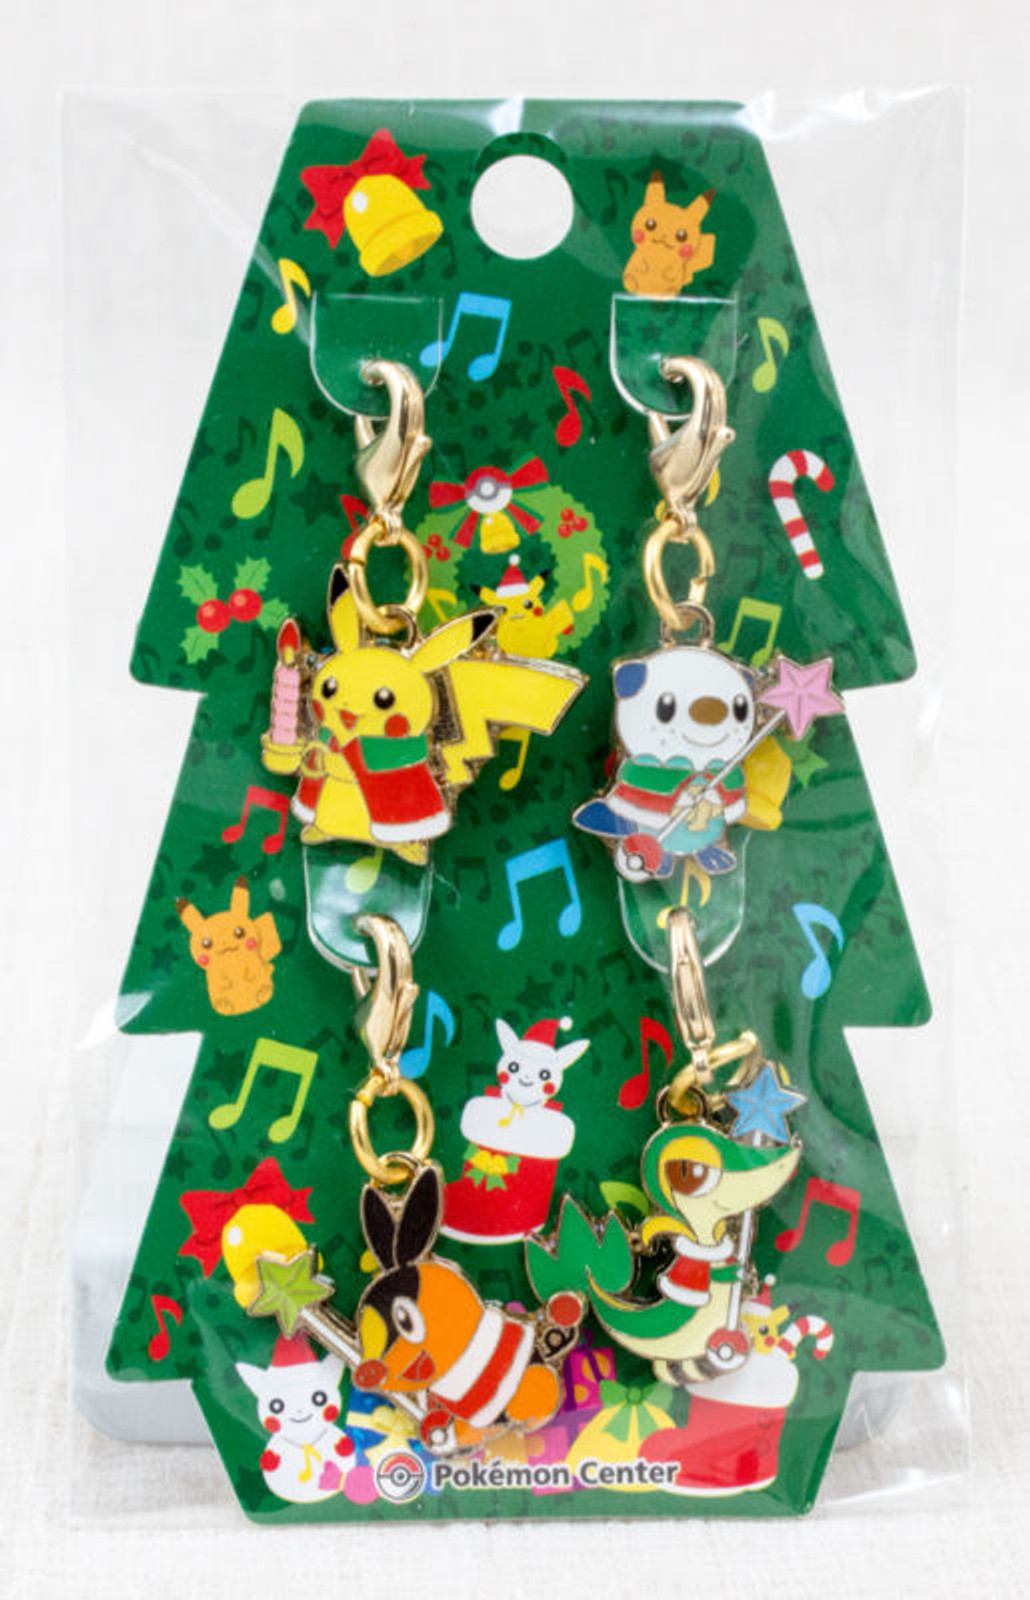 RARE!! Pokemon Metal Charm 4pc Set Christmas Tree 2010 Pikachu Pokemon Center JAPAN ANIME MANGA